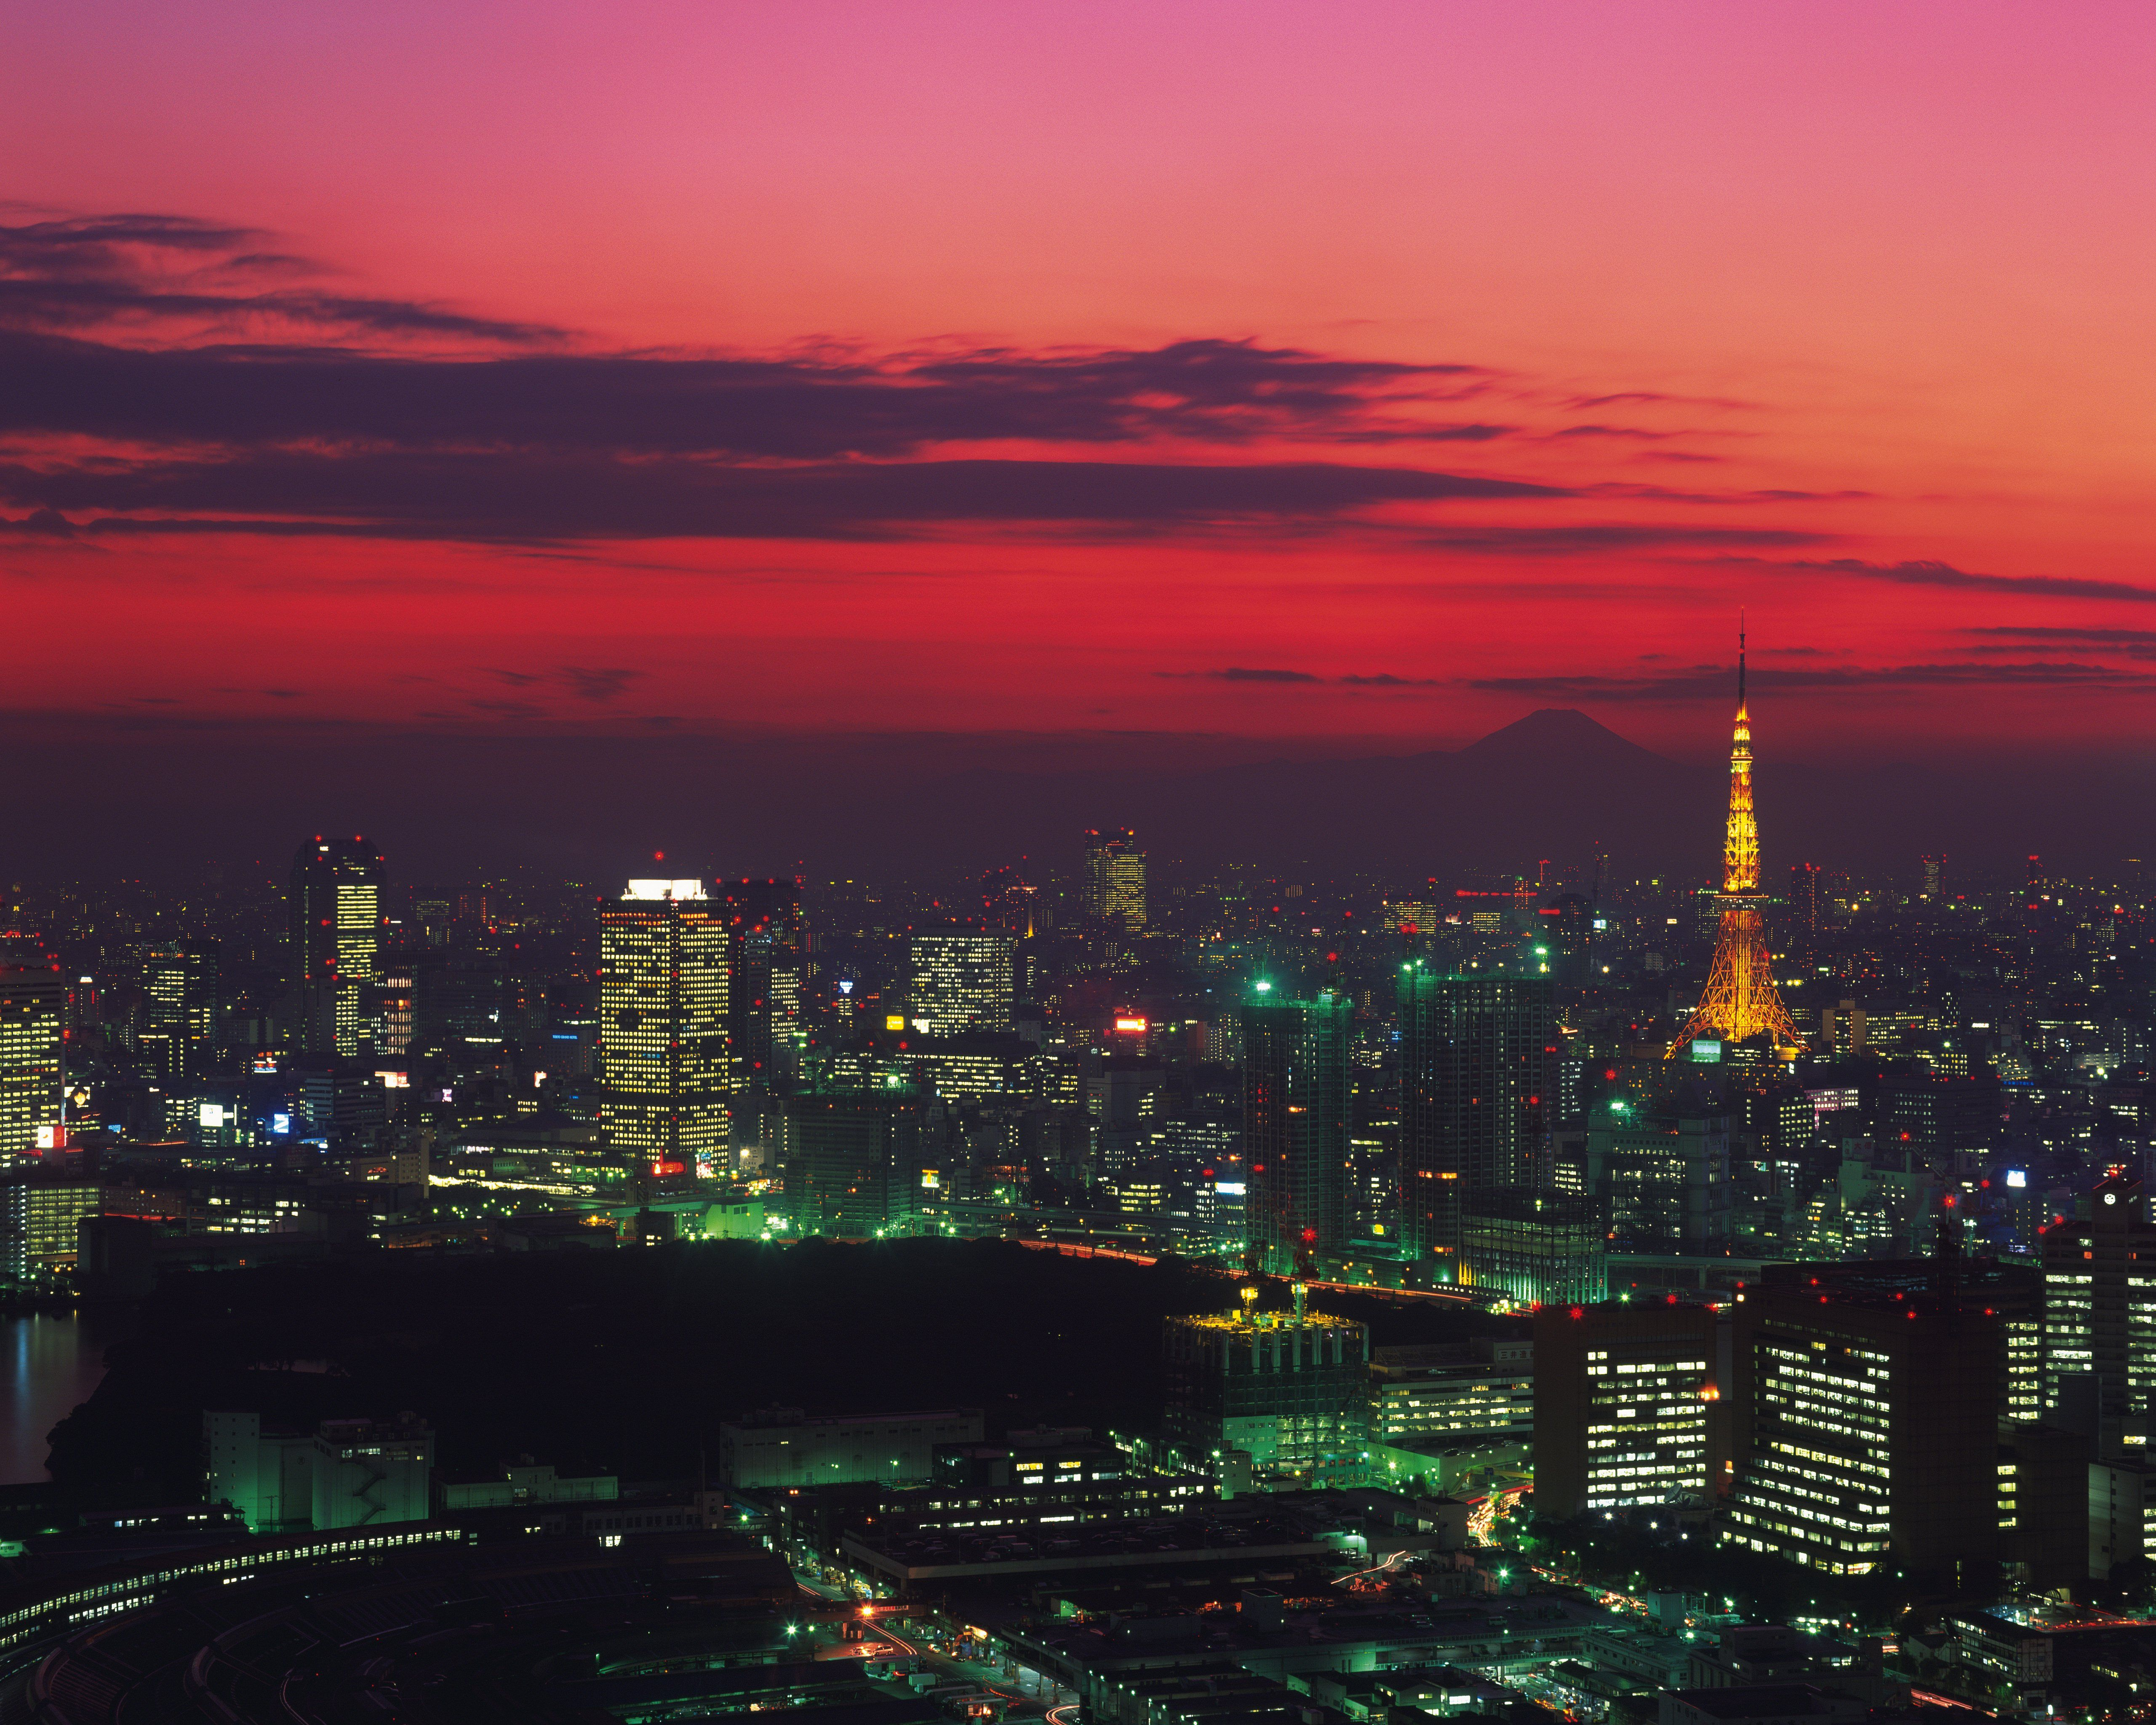 Tokyo 4K Wallpapers - Top Free Tokyo 4K Backgrounds ...